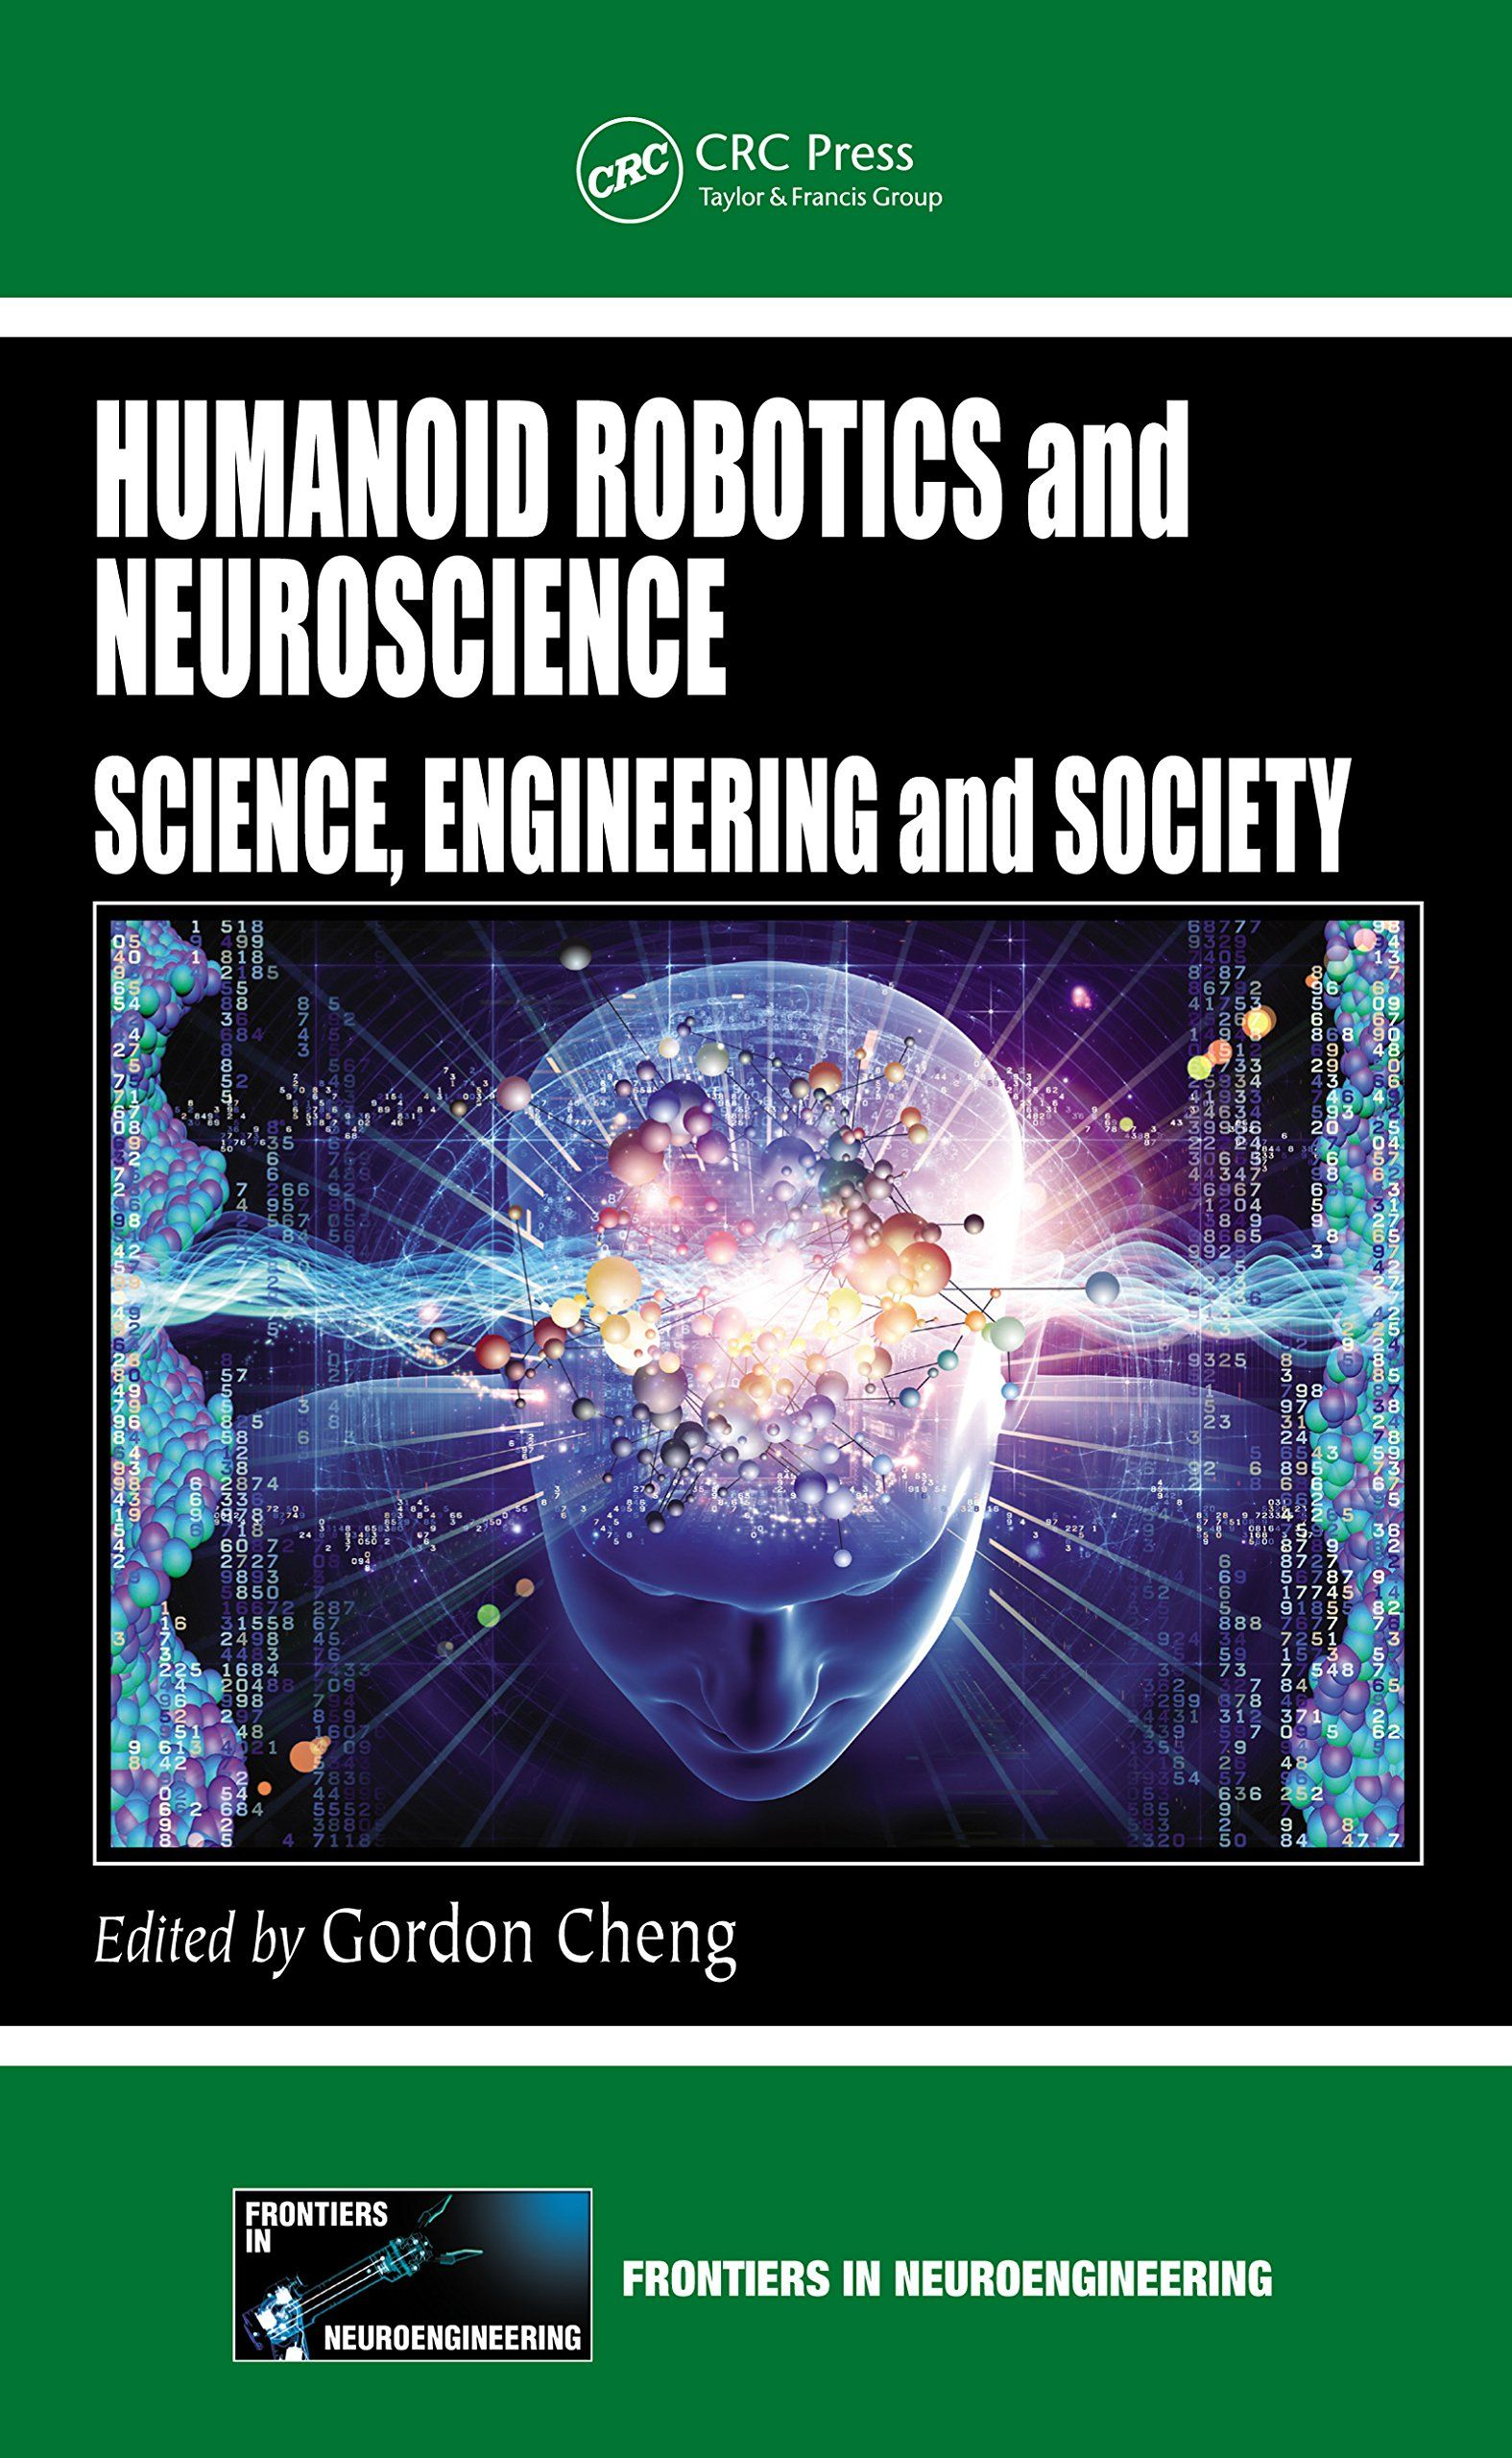 Humanoid robotics and neuroscience: science, engineering and society / Gordon Cheng. 2015.